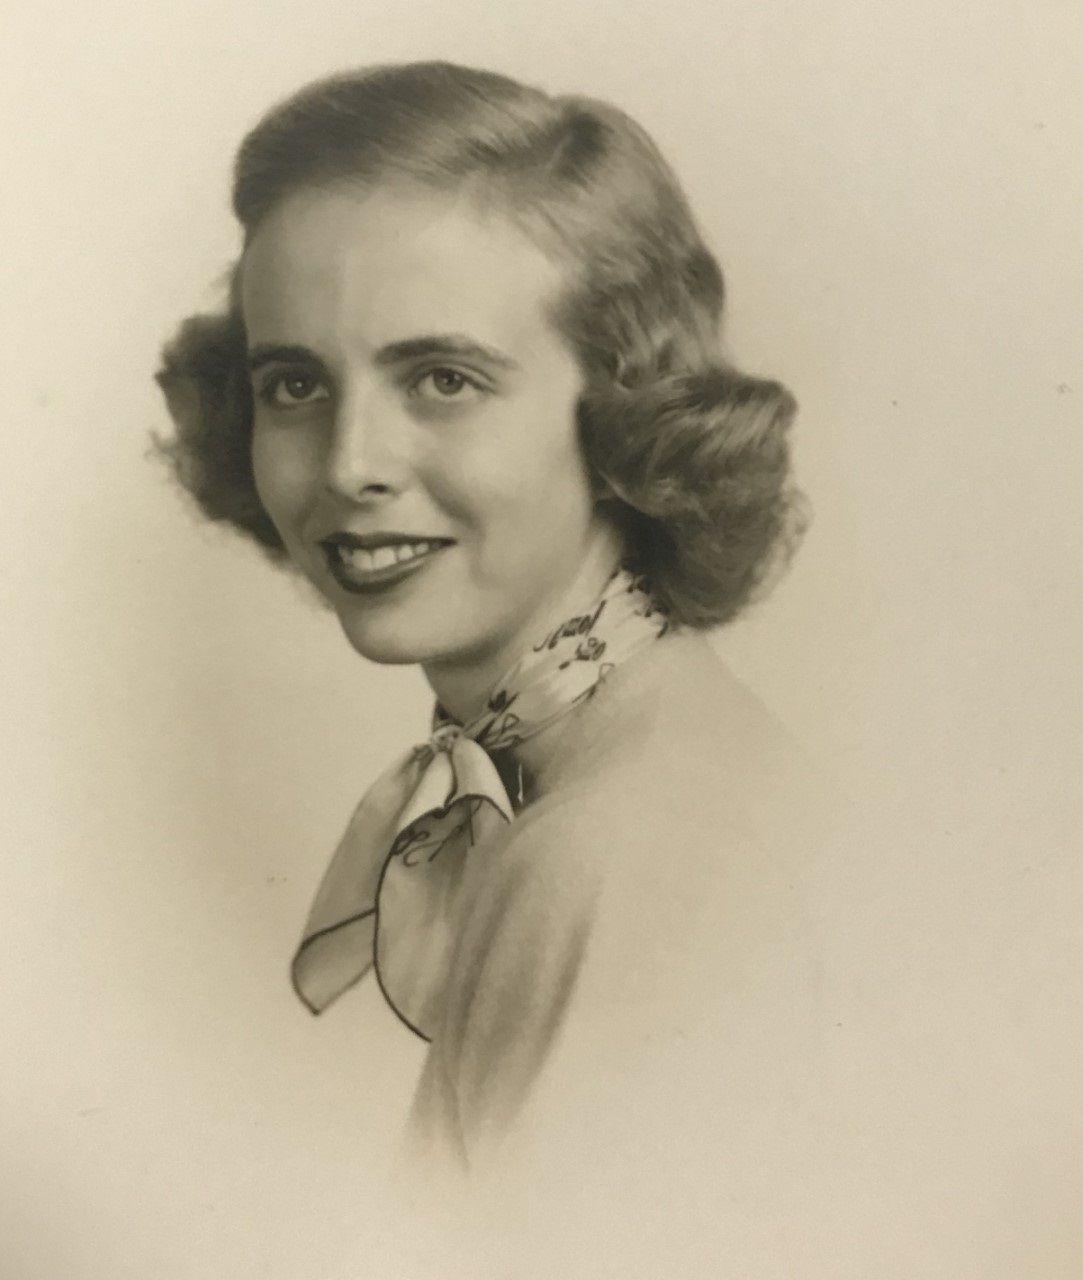 ANN JACKSON EDGECOMBE